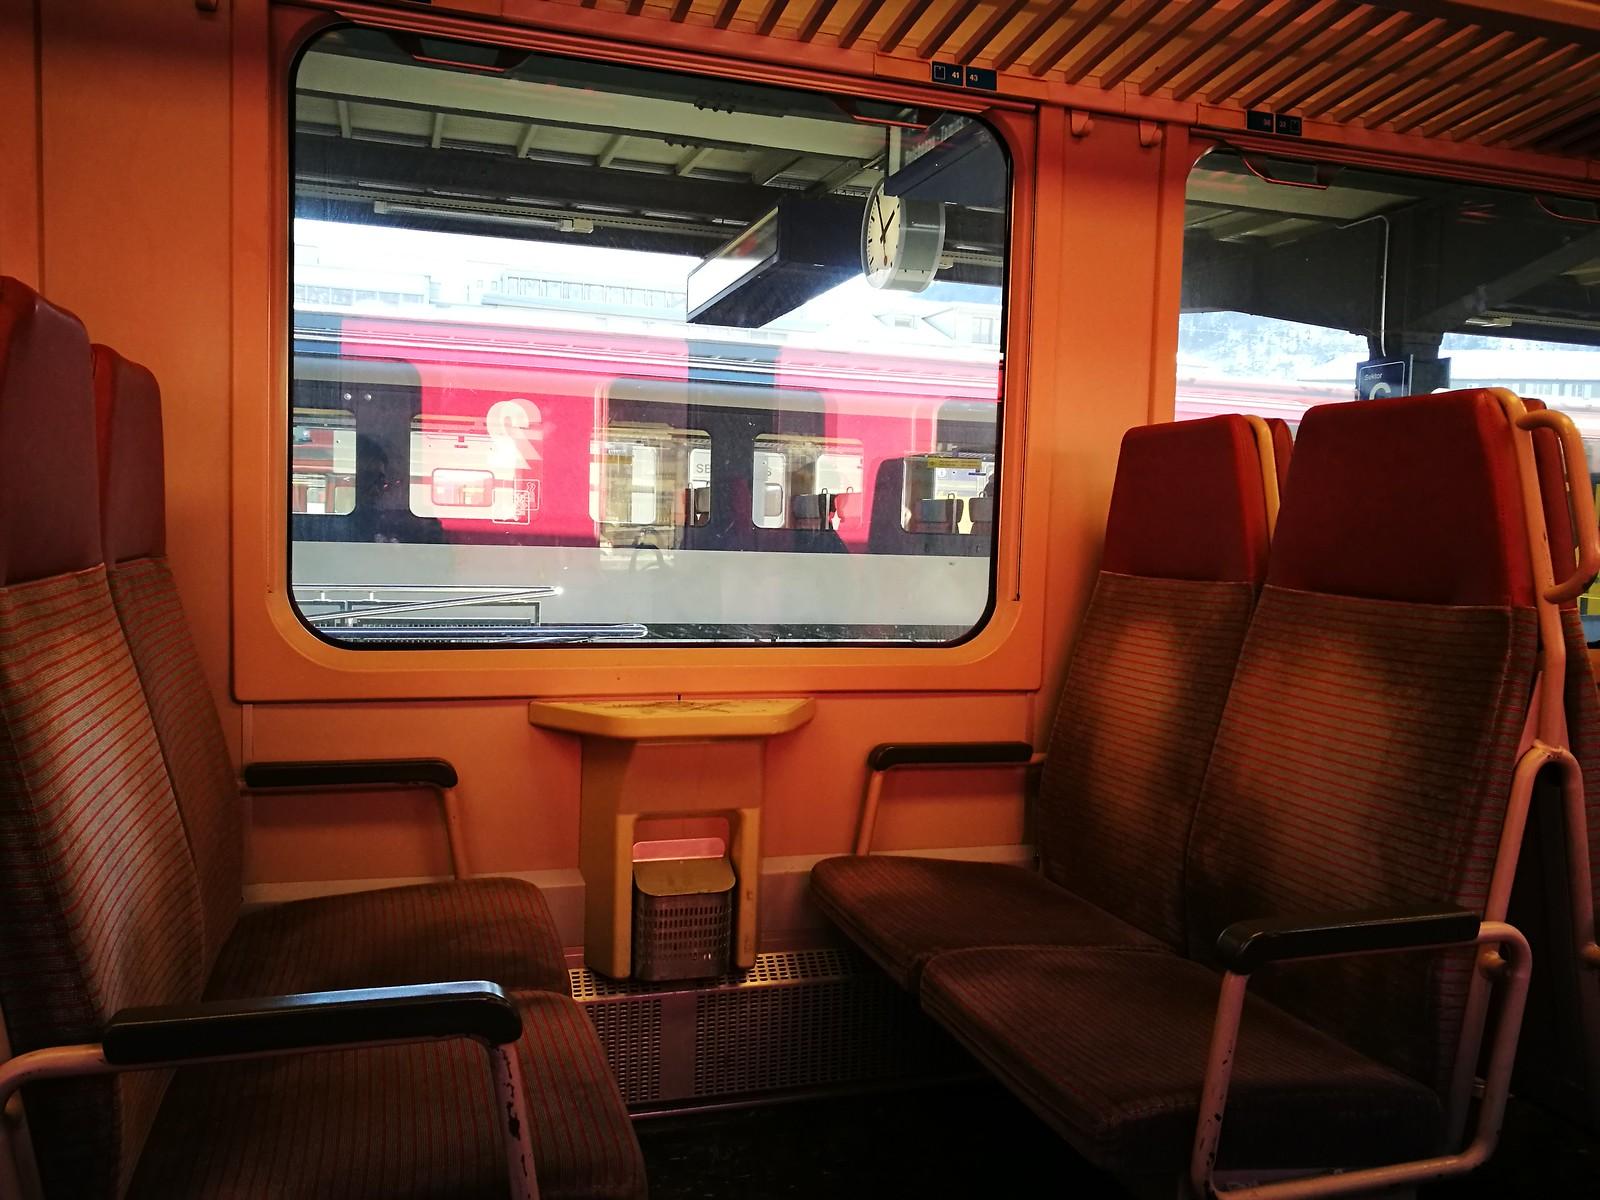 Older seats